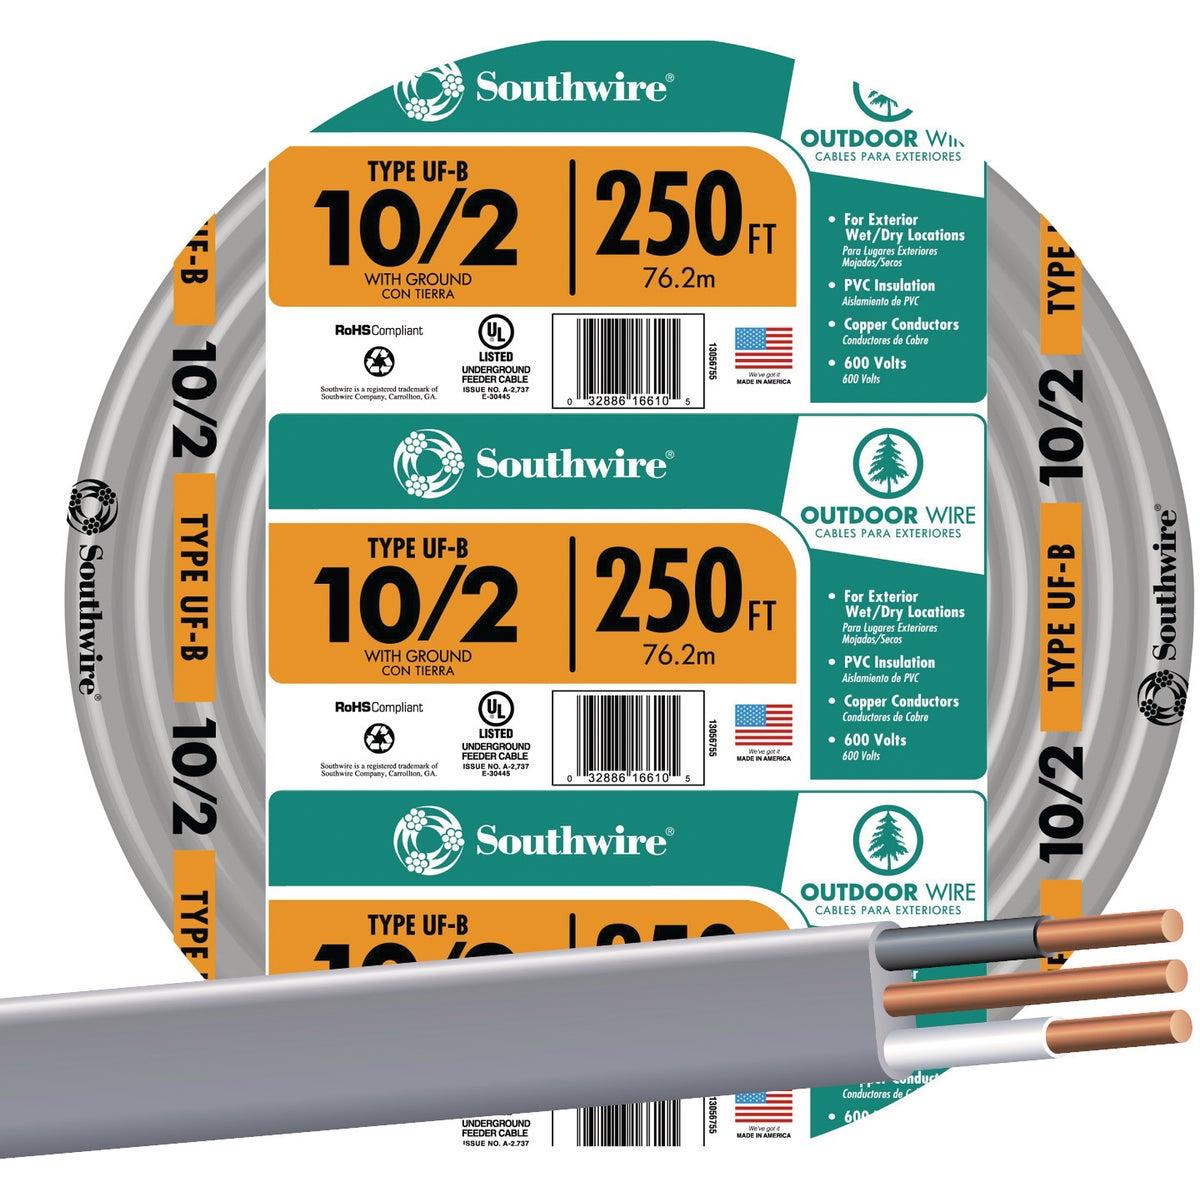 Underground Feeder Cable Jugenheimer Ind Supplies - Page 1